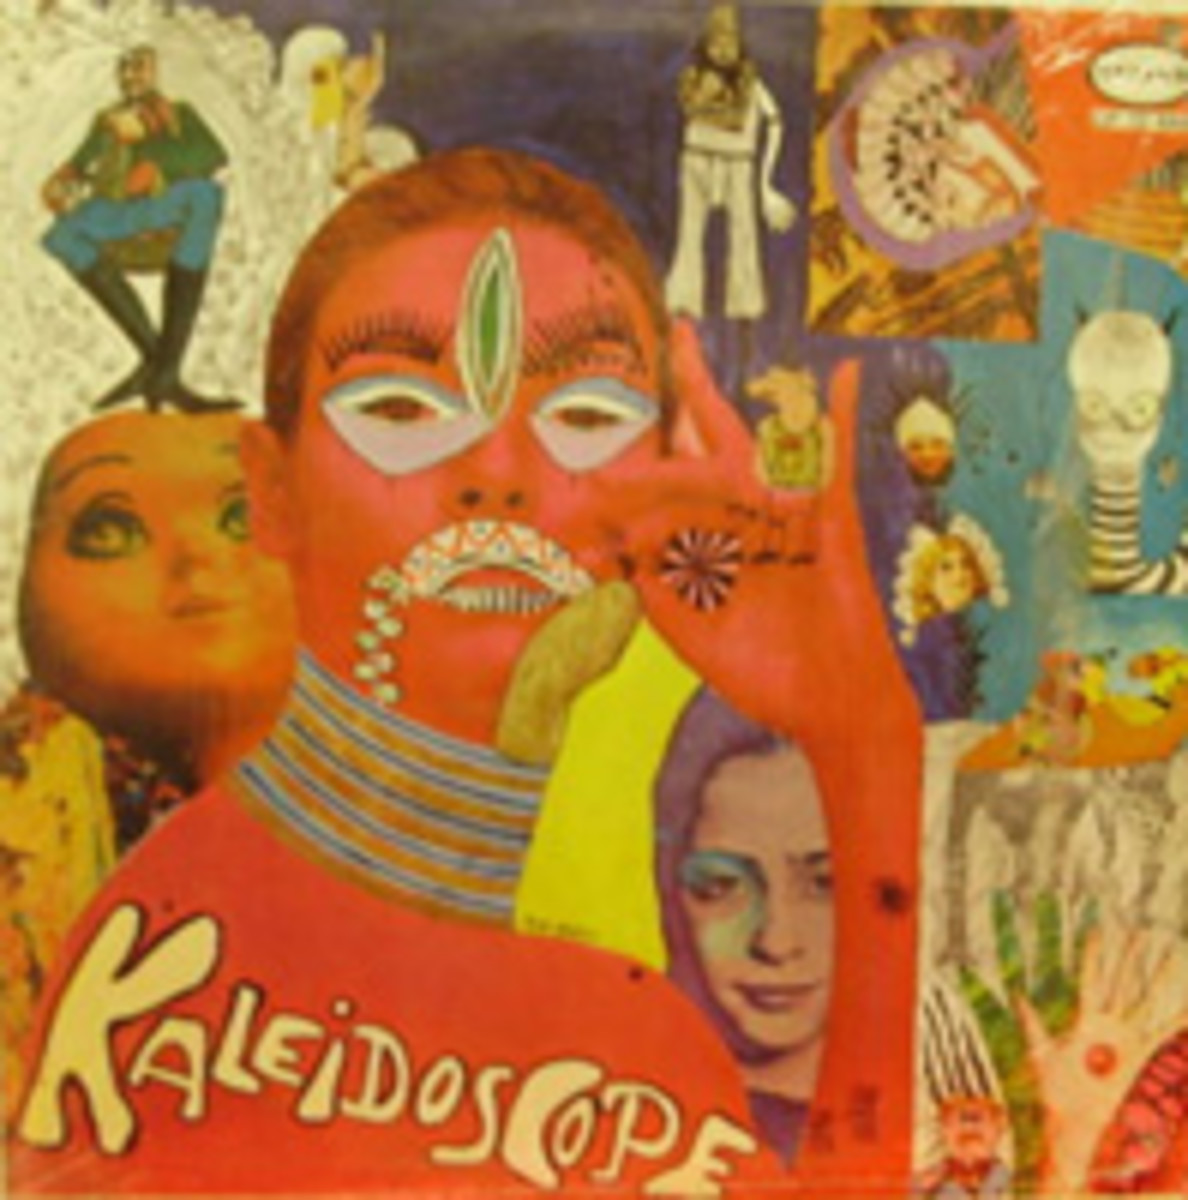 Kaleidoscope LP